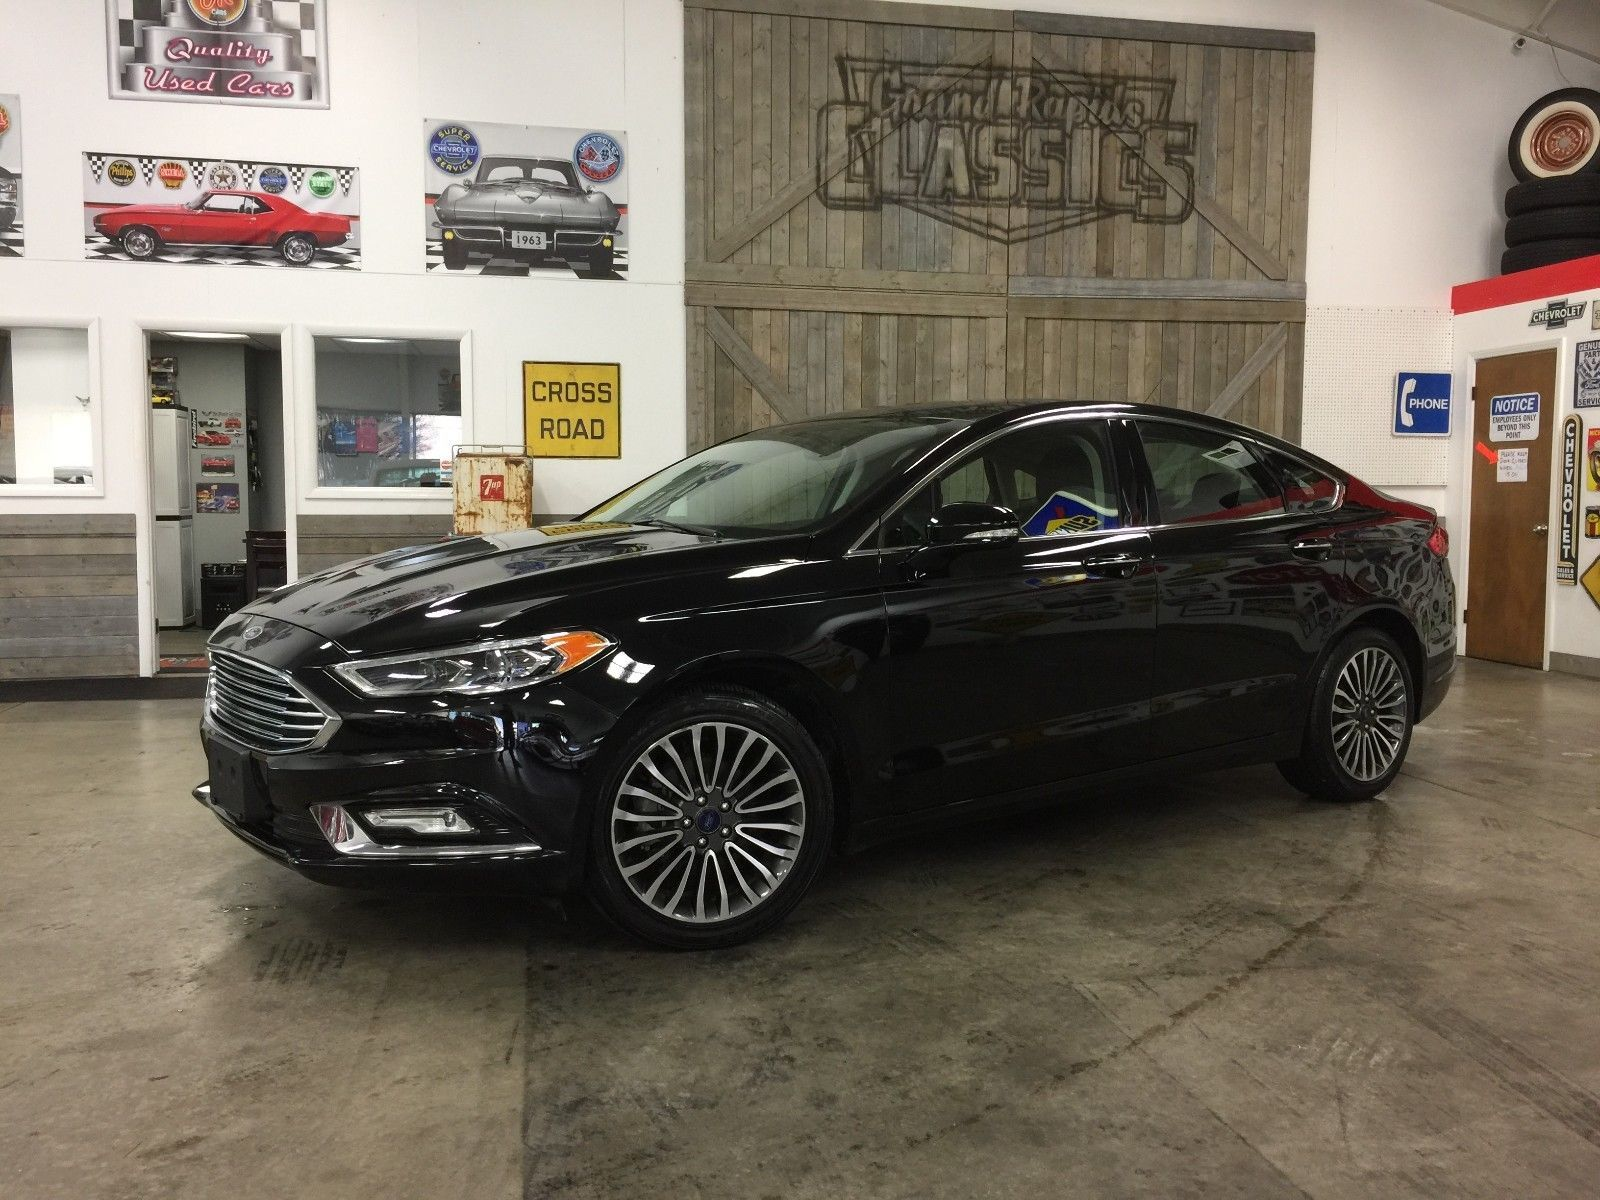 2017 Ford Fusion Titanium Hybrid Ford Fusion Awd Ford Fusion Awd